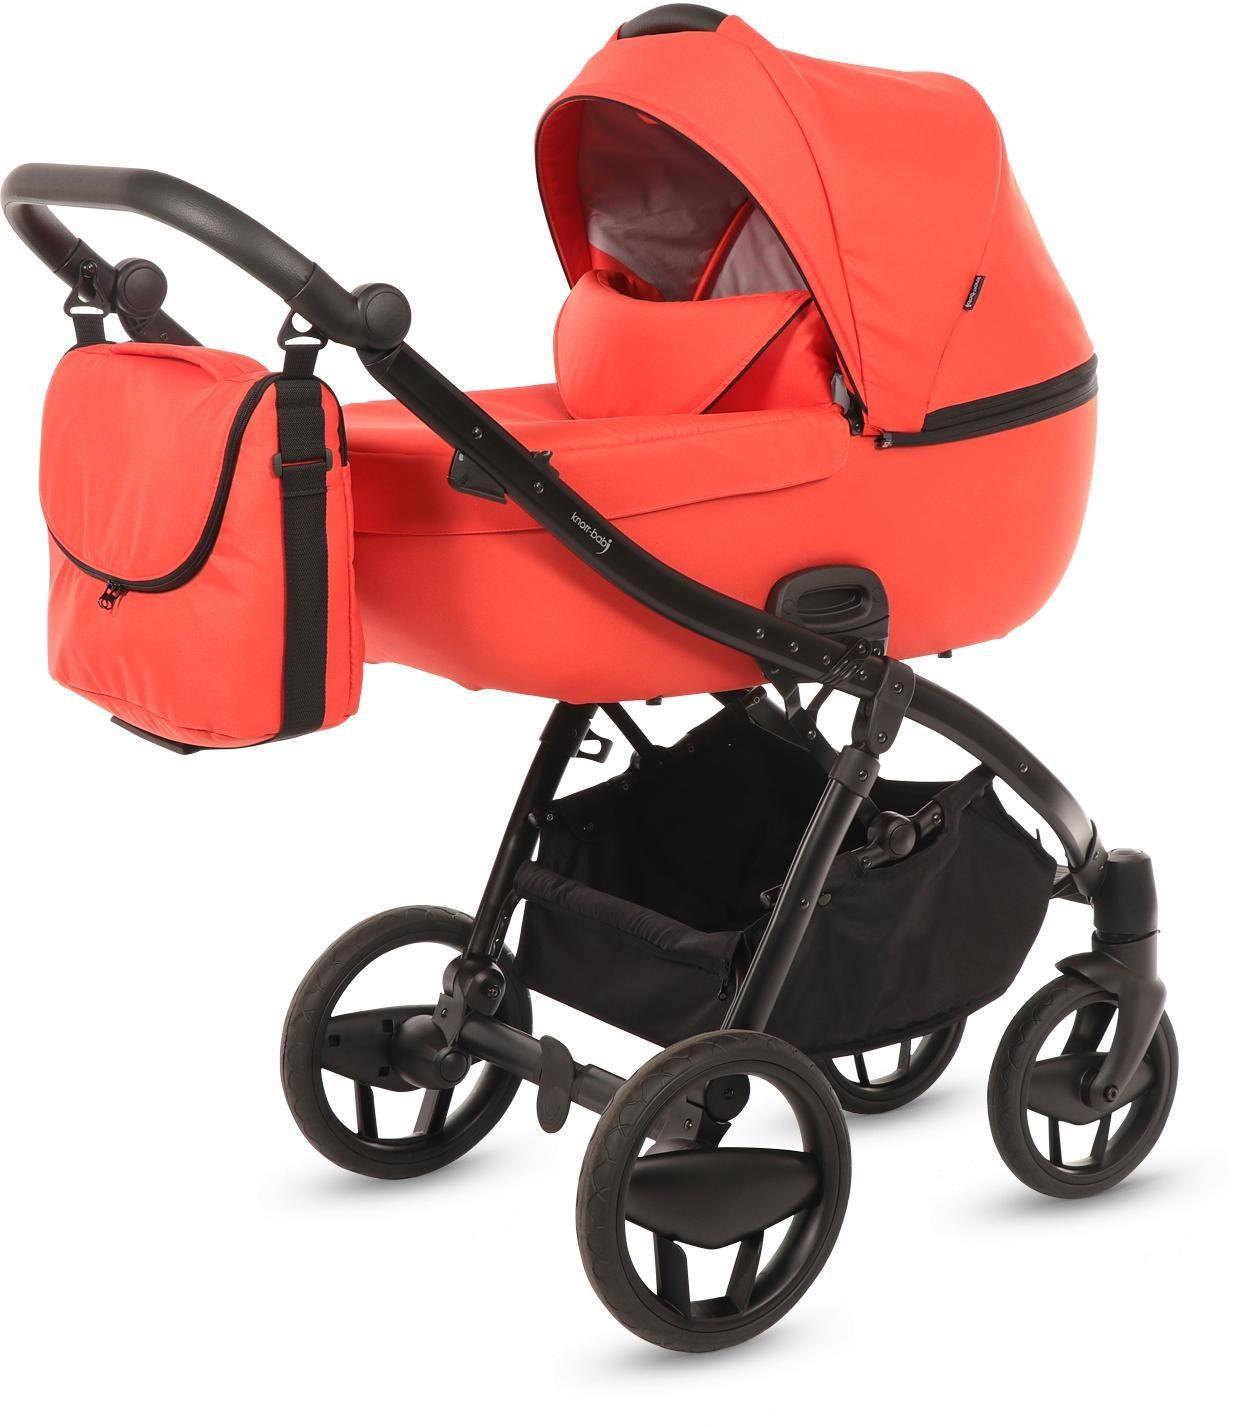 knorr-baby Kombi-Kinderwagen Set, »Piquetto, tropaz«